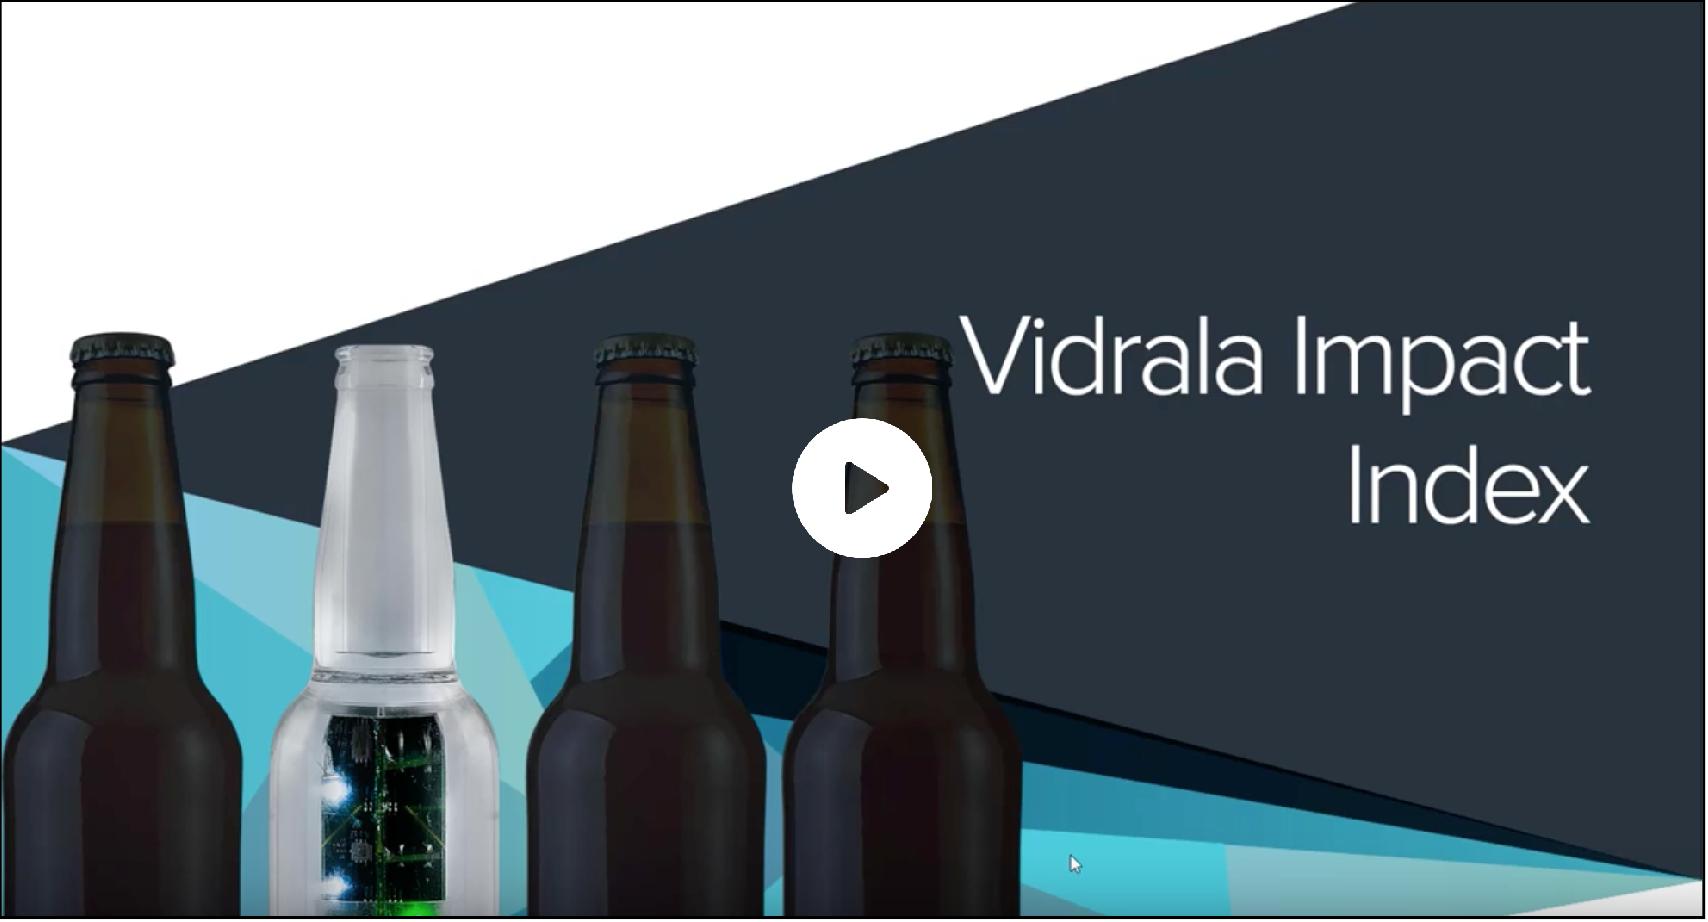 Video for Vidrala Impact Index